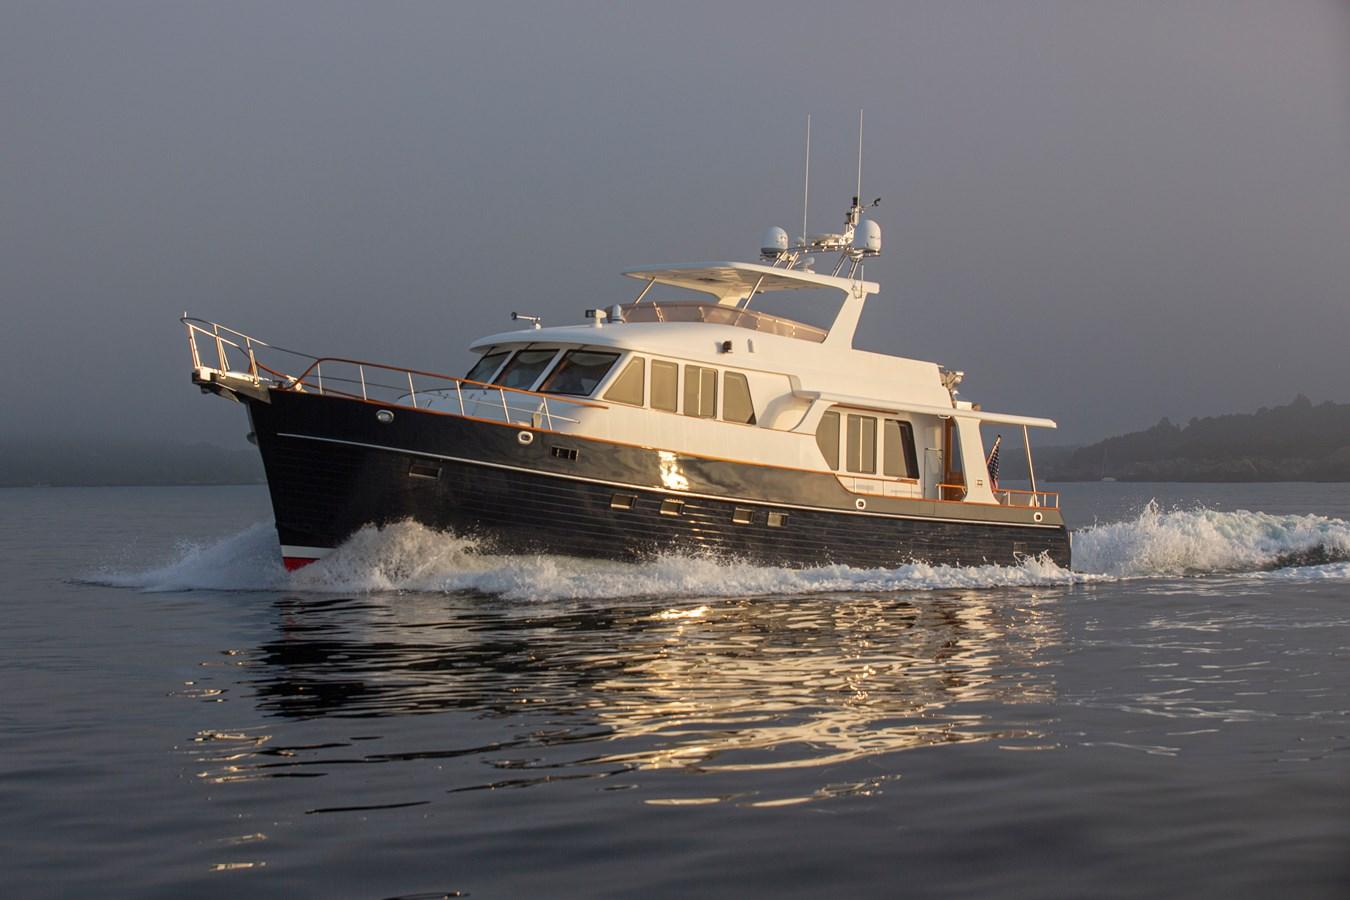 082119BTPN-4333 2006 GRAND BANKS 59 Aleutian RP Motor Yacht 2877388